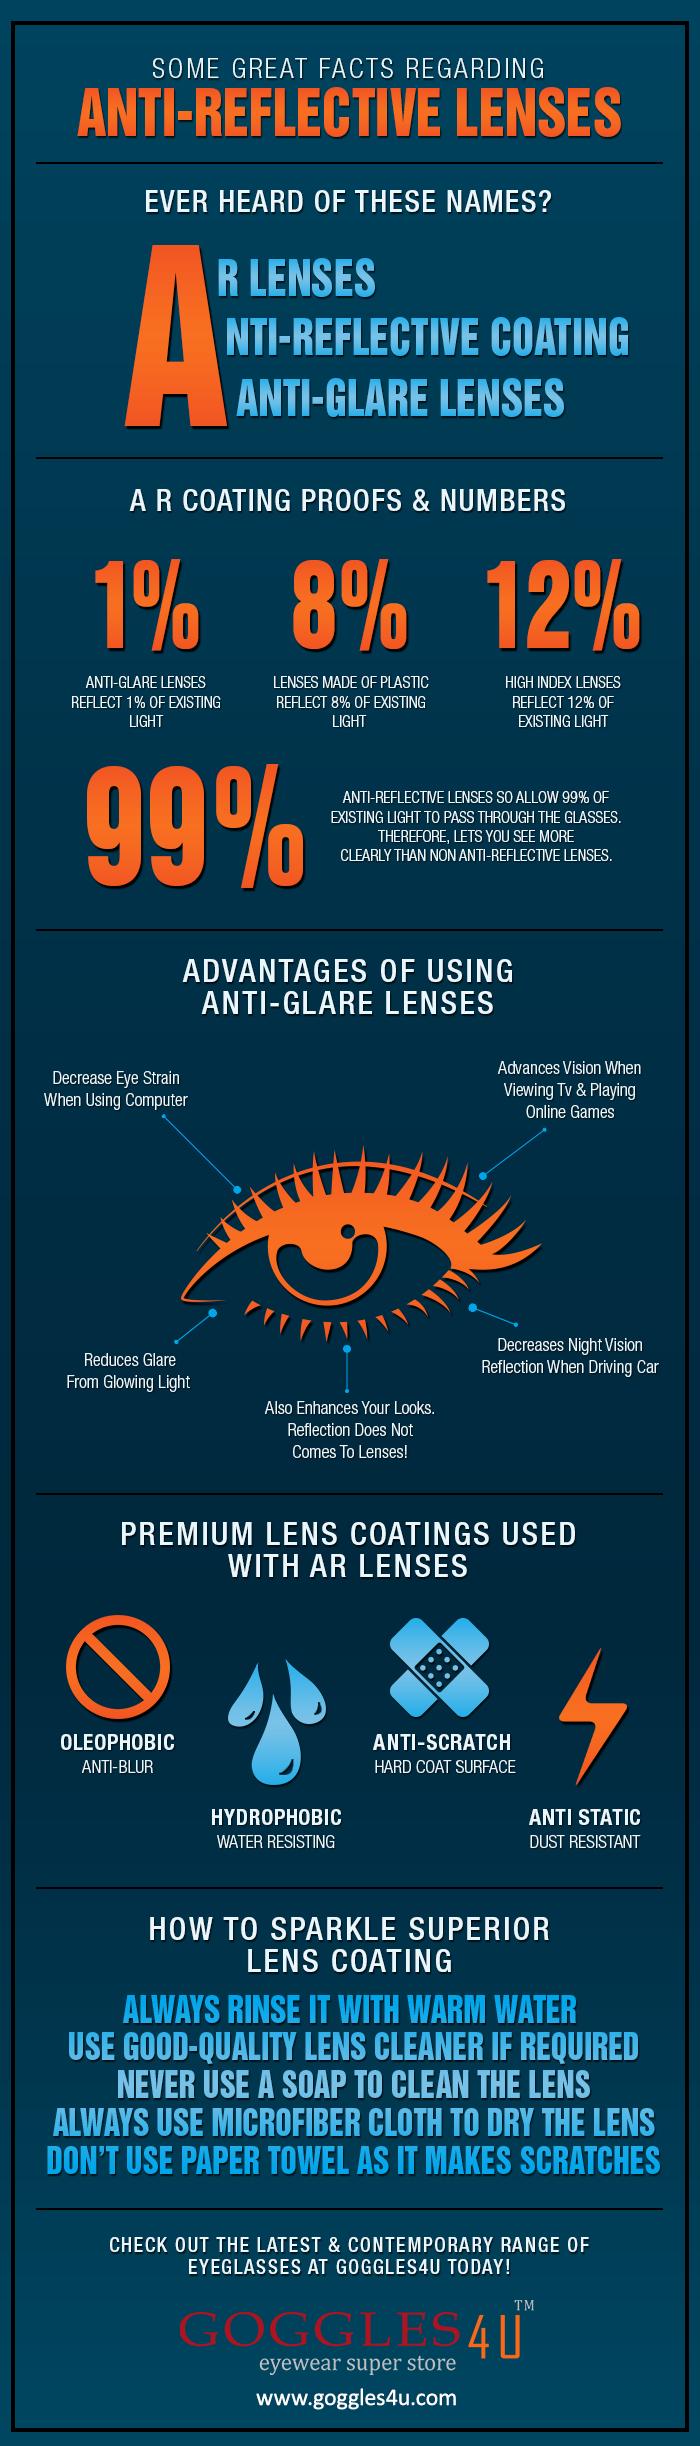 Infographic on Facts Regarding Anti-Reflective Lenses